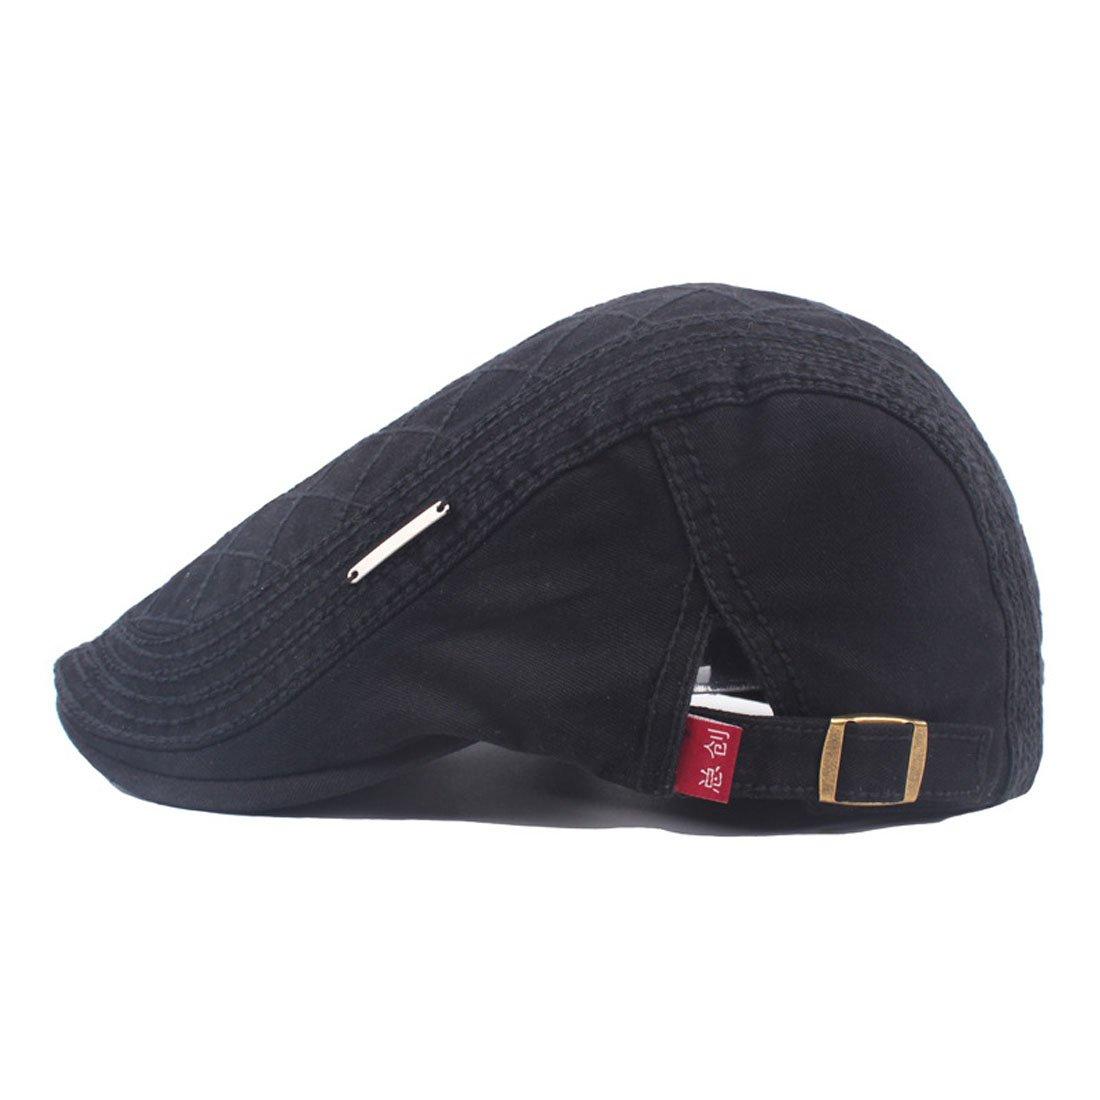 King Star Mens Cotton Ivy Gatsby Newsboy Driving Hat Flat Cap